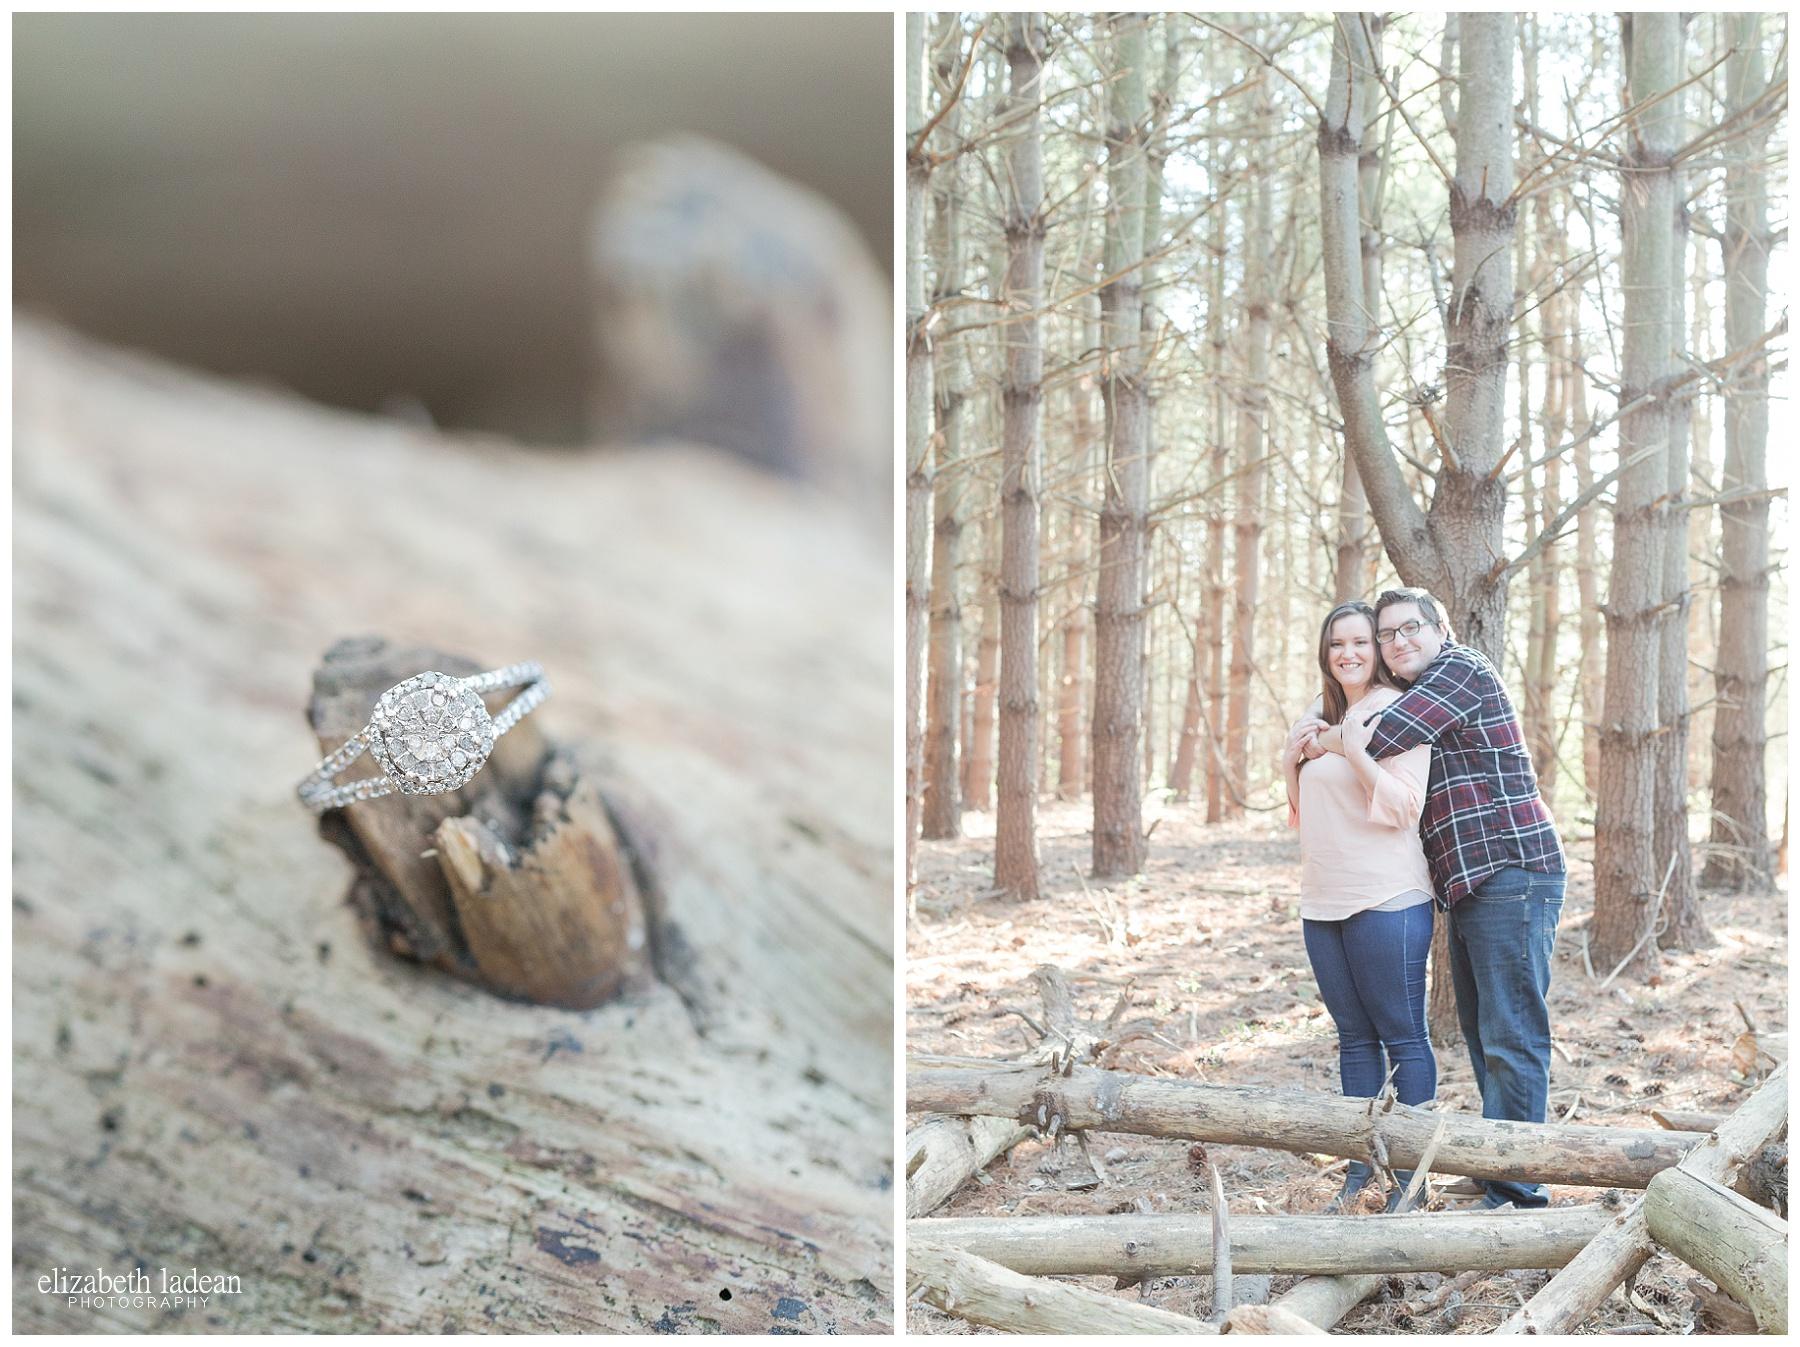 Burr-Oak-Woods-Engagement-Photos-Kansas City-S+J-2017-Elizabeth-Ladean-Photography-photo_0490.jpg